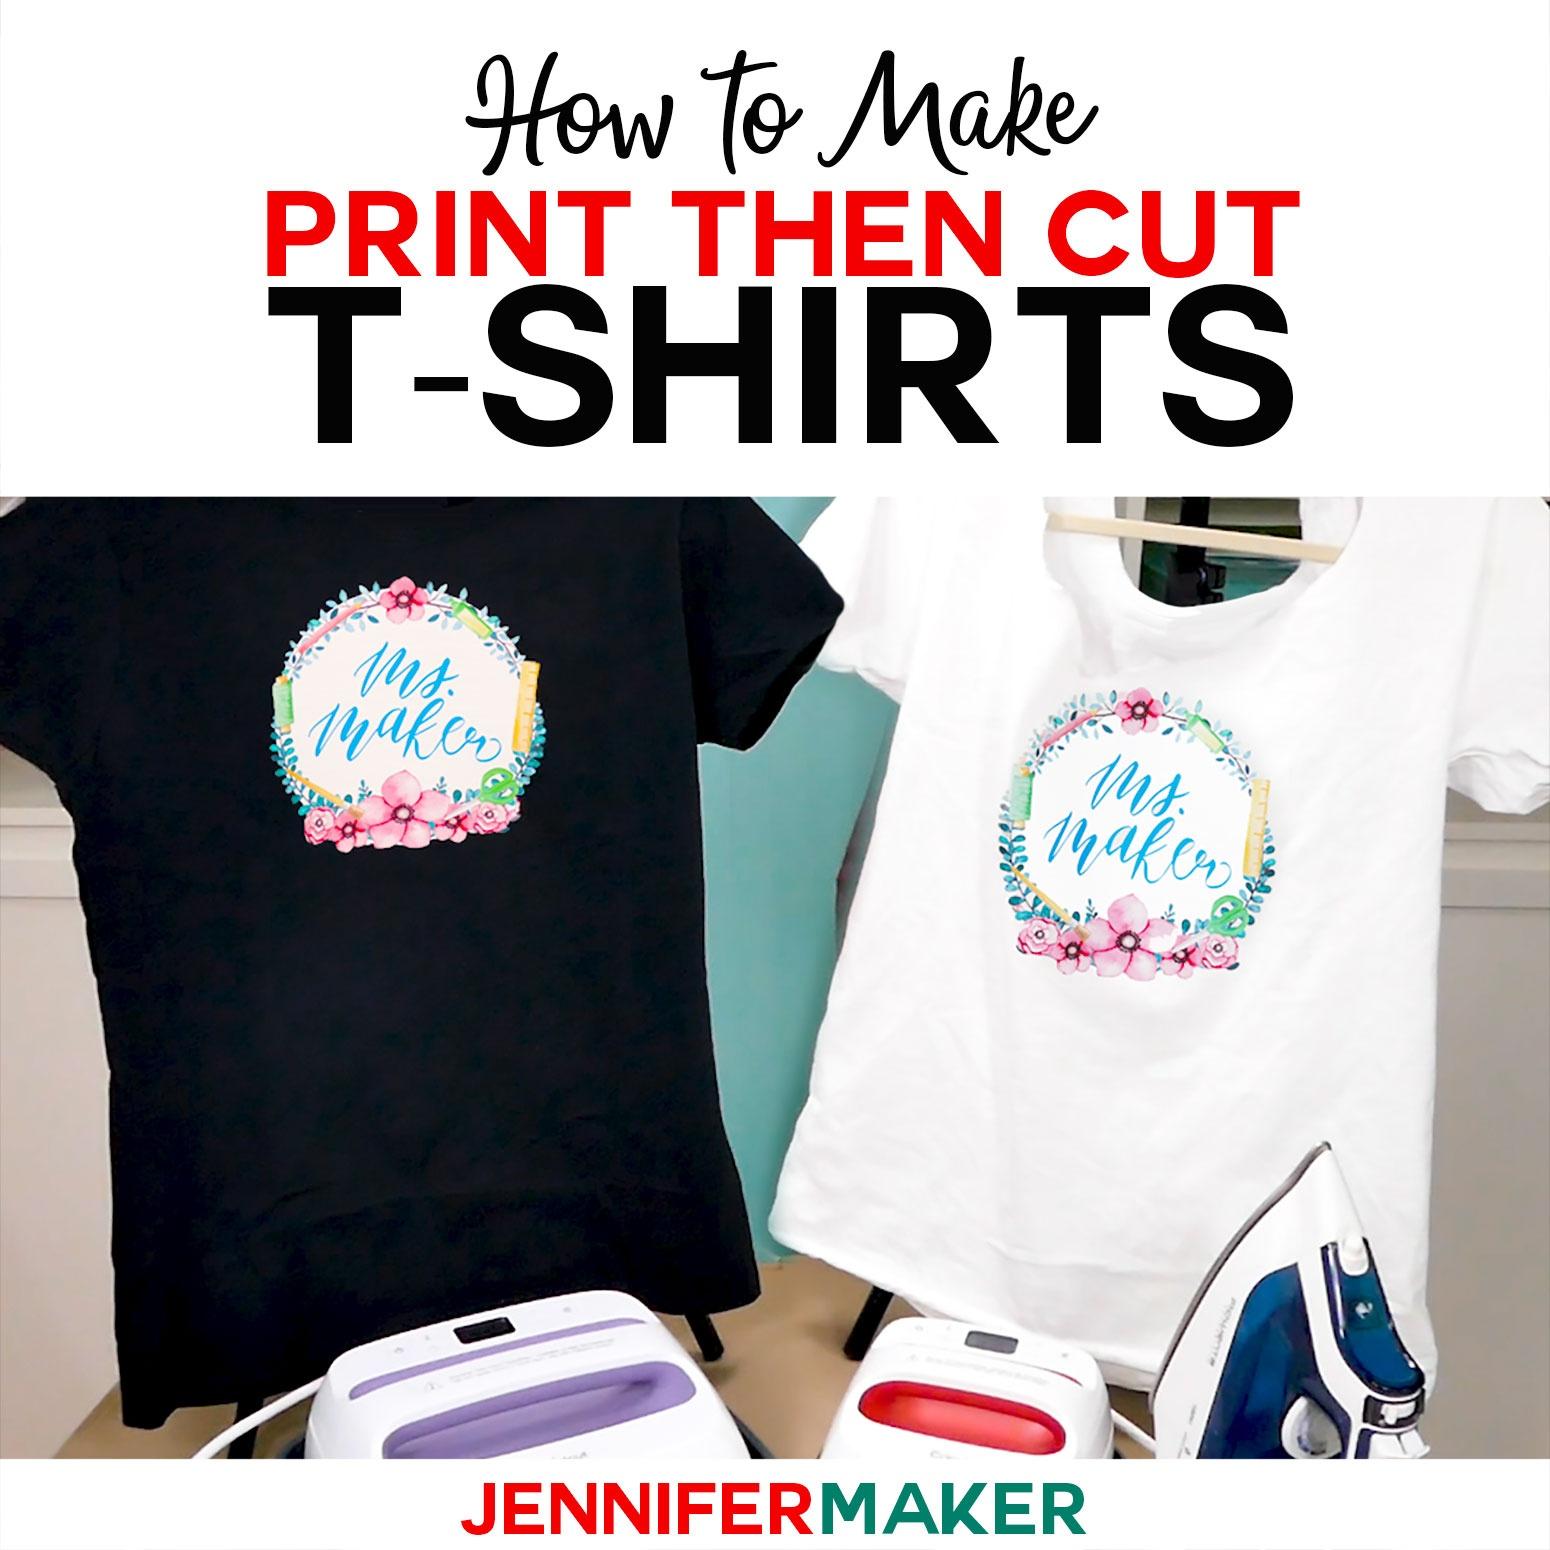 Print Then Cut Cricut Transfer T-Shirts - Jennifer Maker - Free Printable Christmas Iron On Transfers